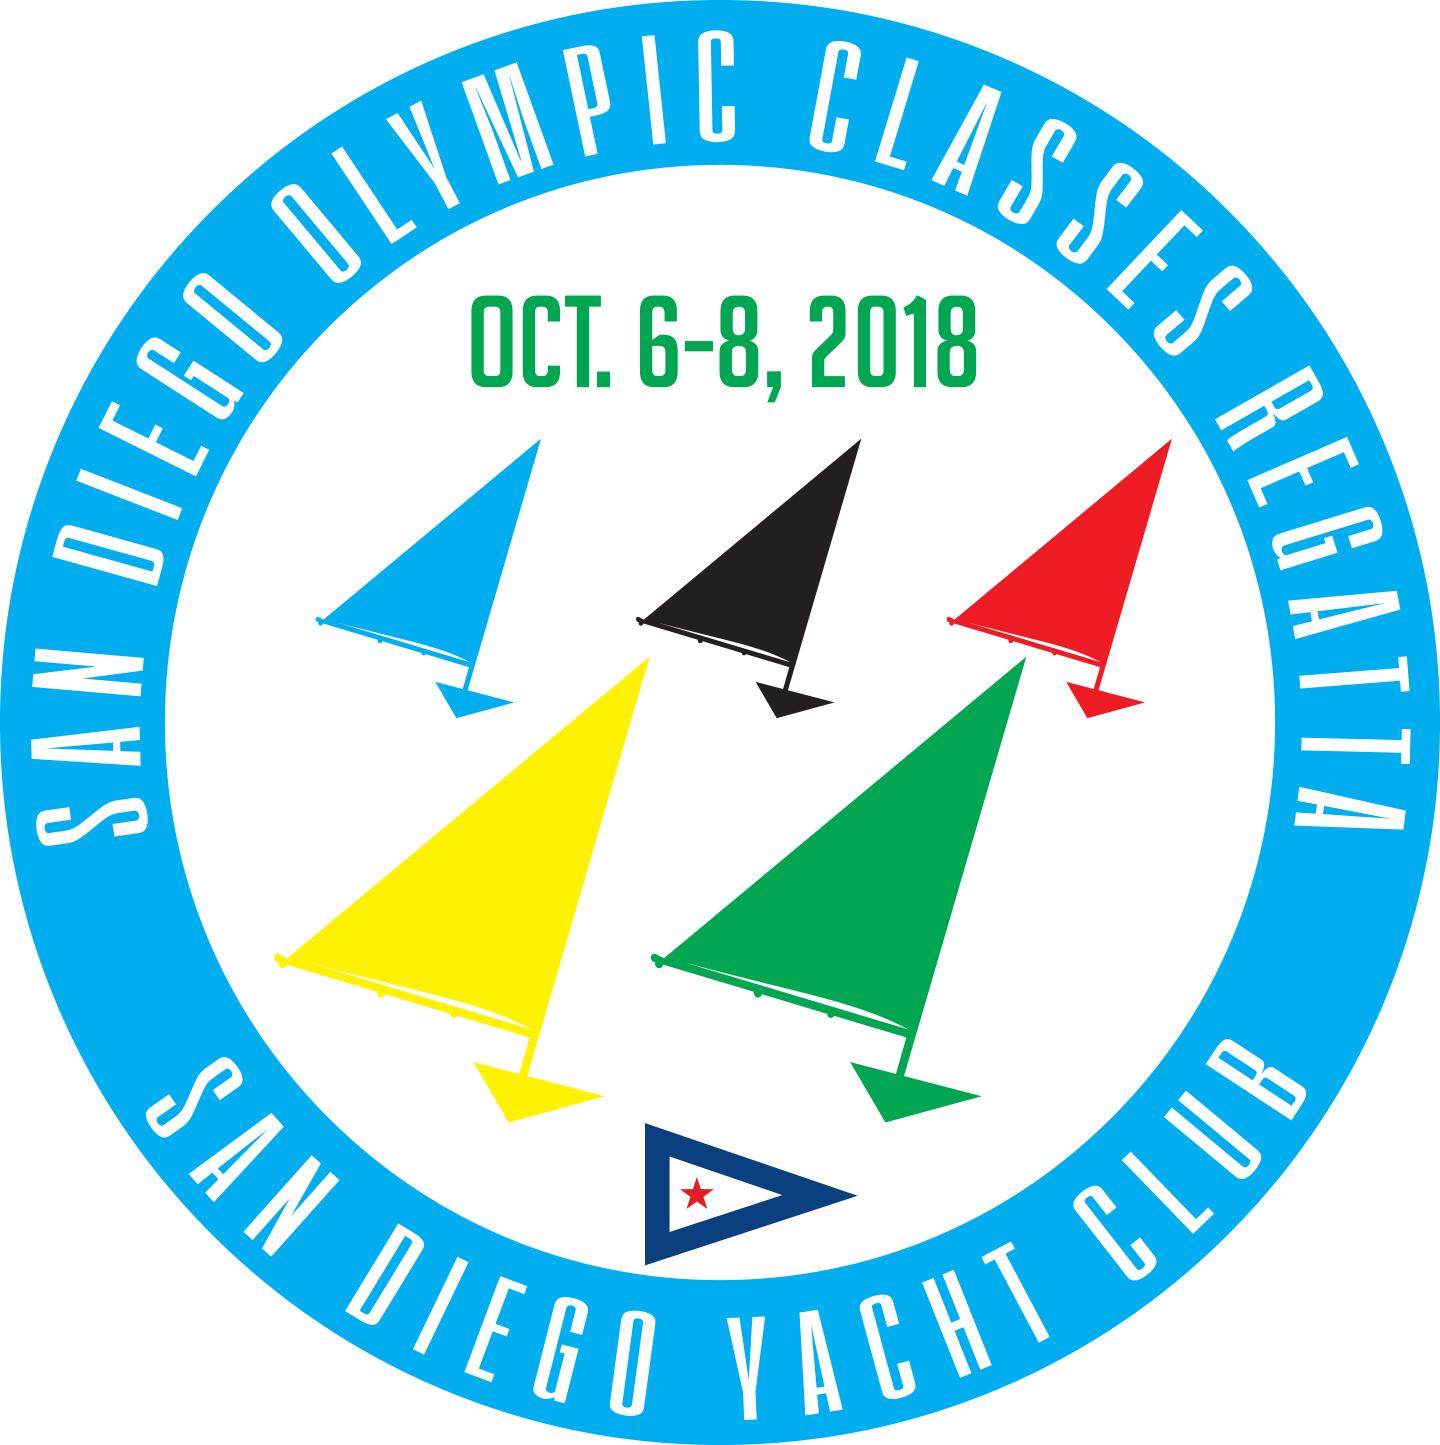 San Diego Olympic Classes Regatta 2018 Logo V2